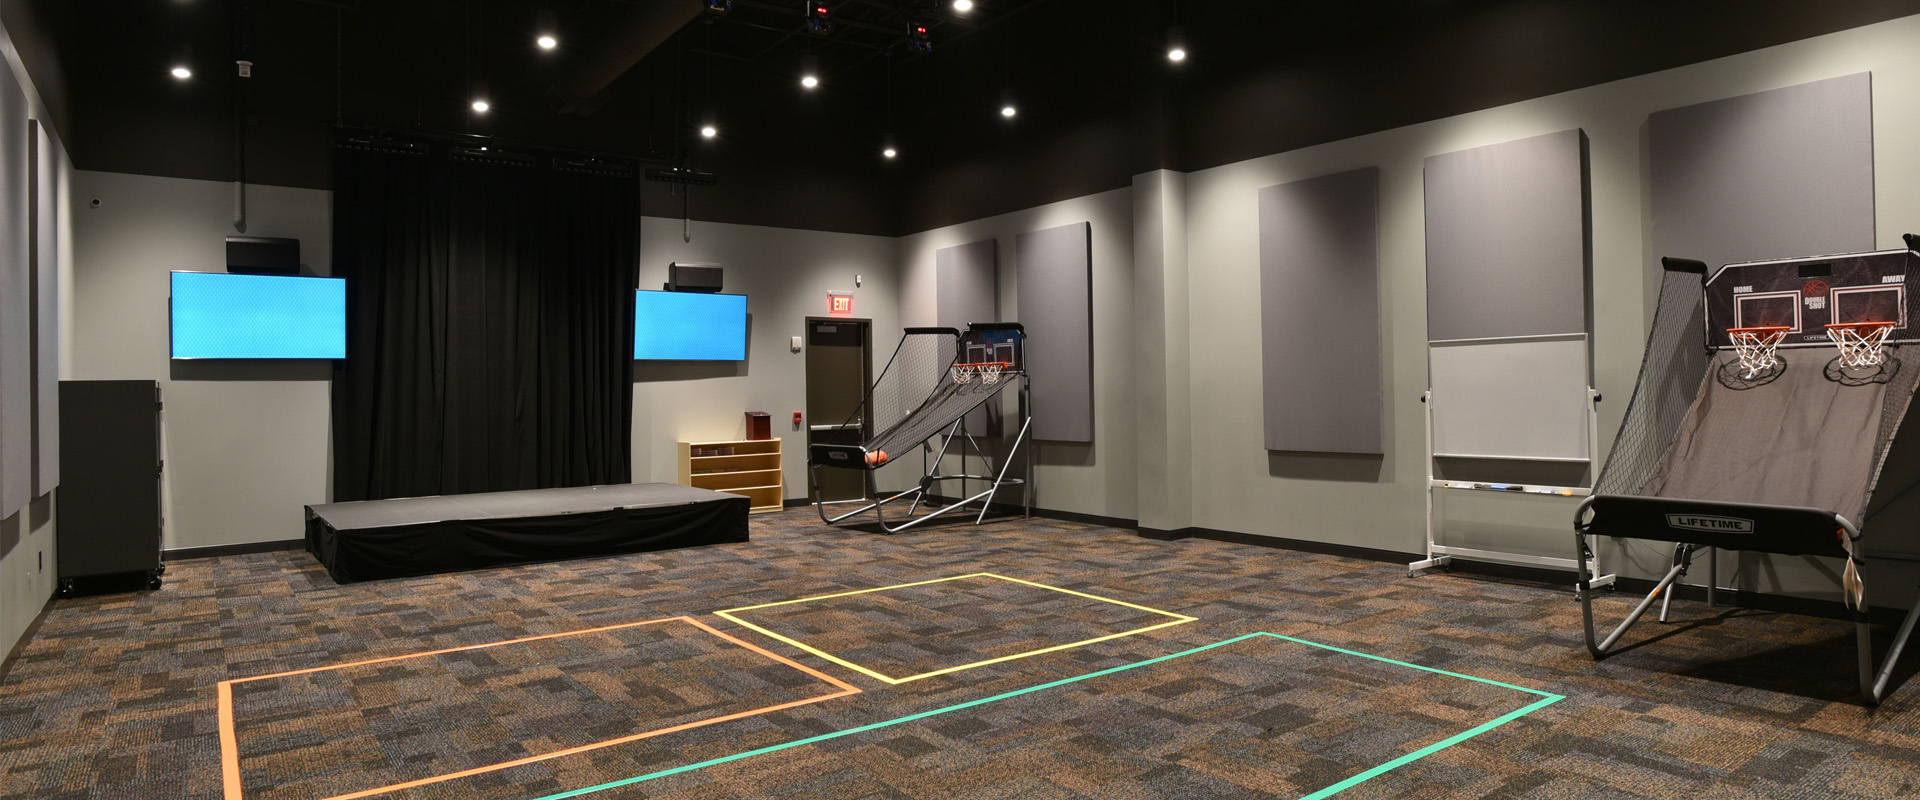 12Stone Church Buford - Children's Theater